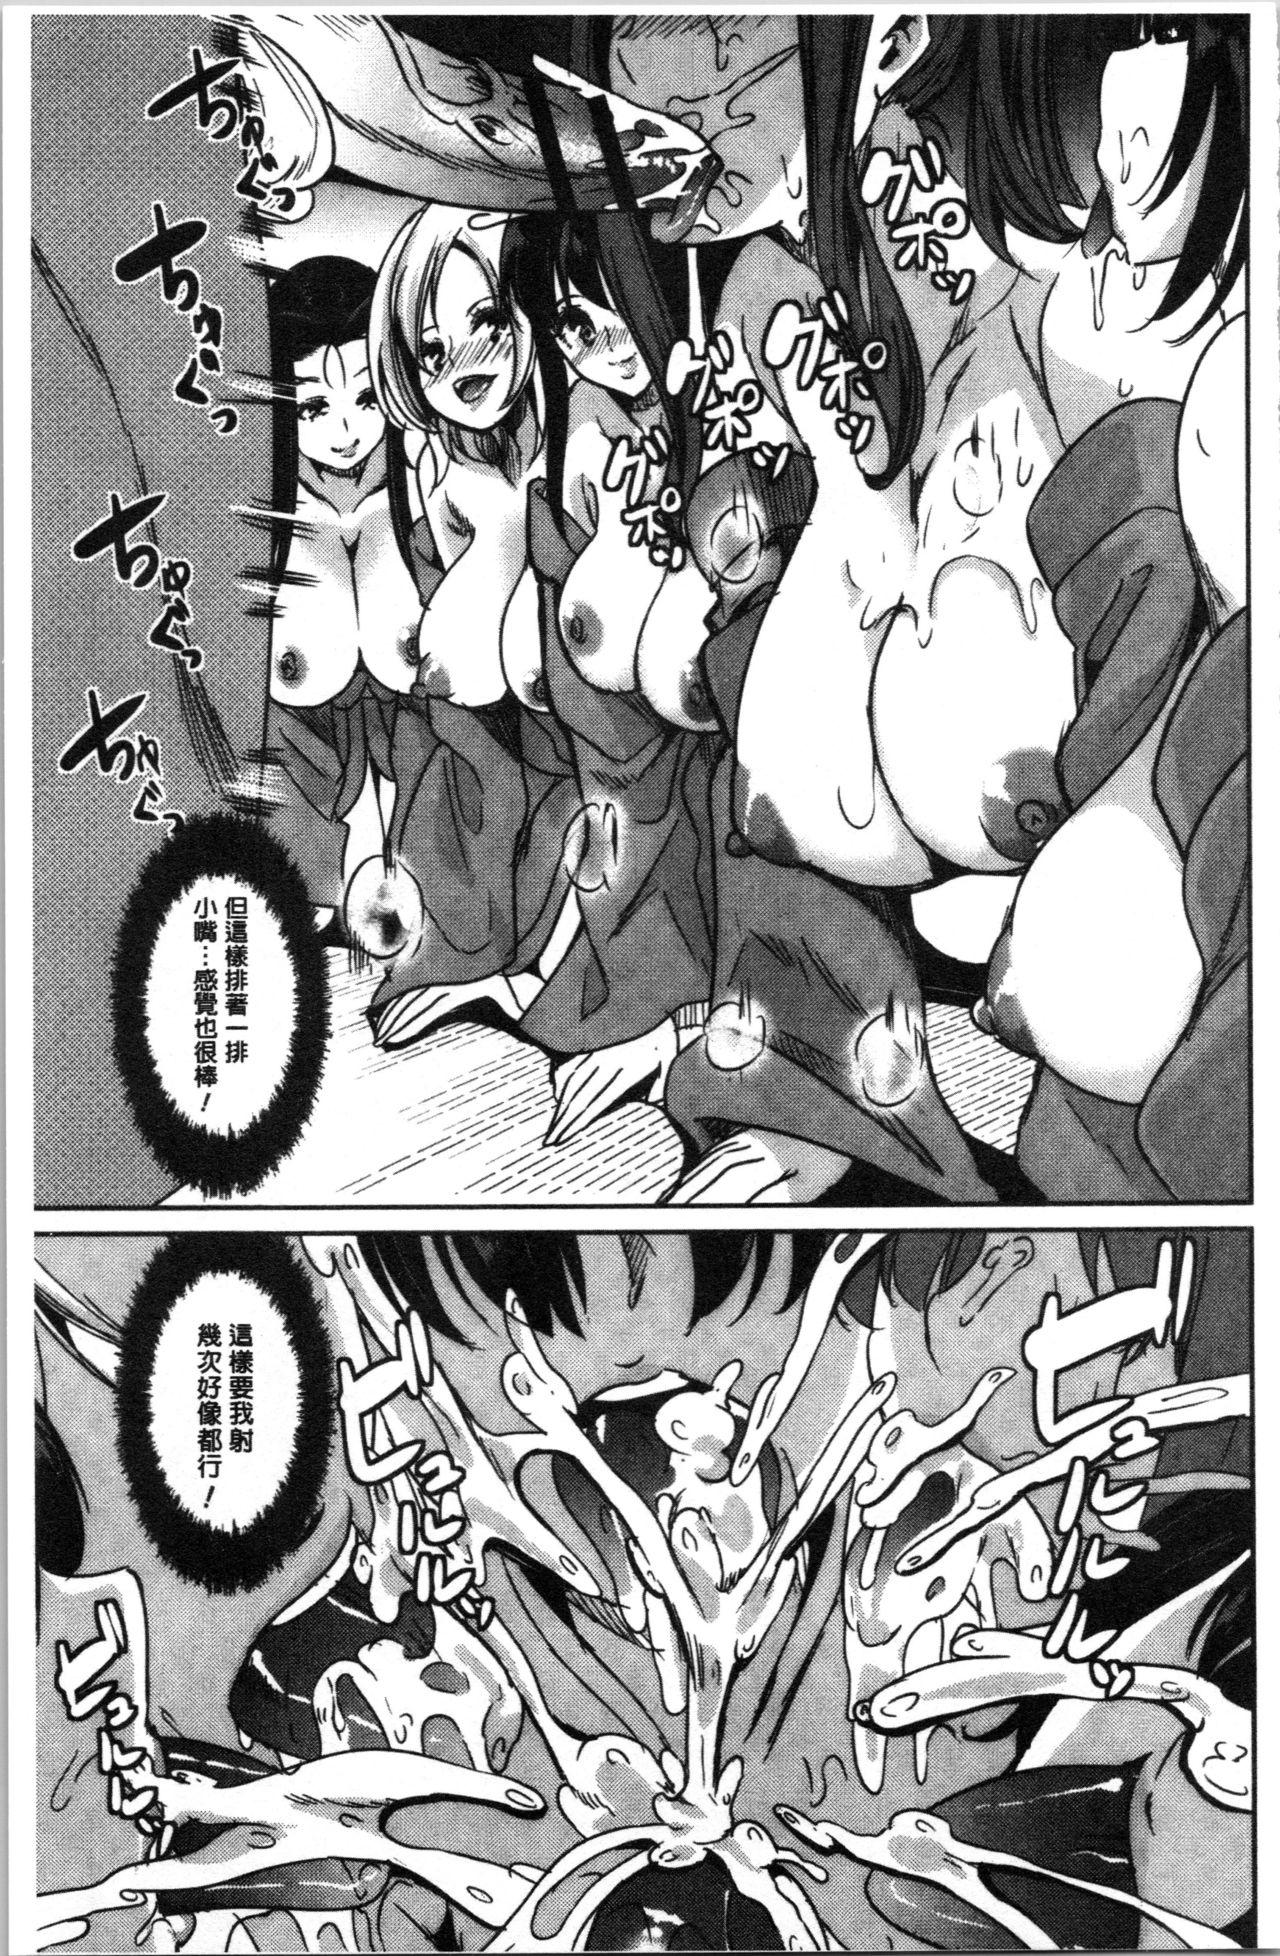 [Ootori Mahiro] Boku no Super Harem Sentou ~Otome no Naka ni Otoko wa Boku dake~ - My super harlem public bath, I am the only man in the public bath full of pussy cats. | 我的後宮選妃般的超級錢湯~乙女之間只有我一個男人~ [Chinese] 128